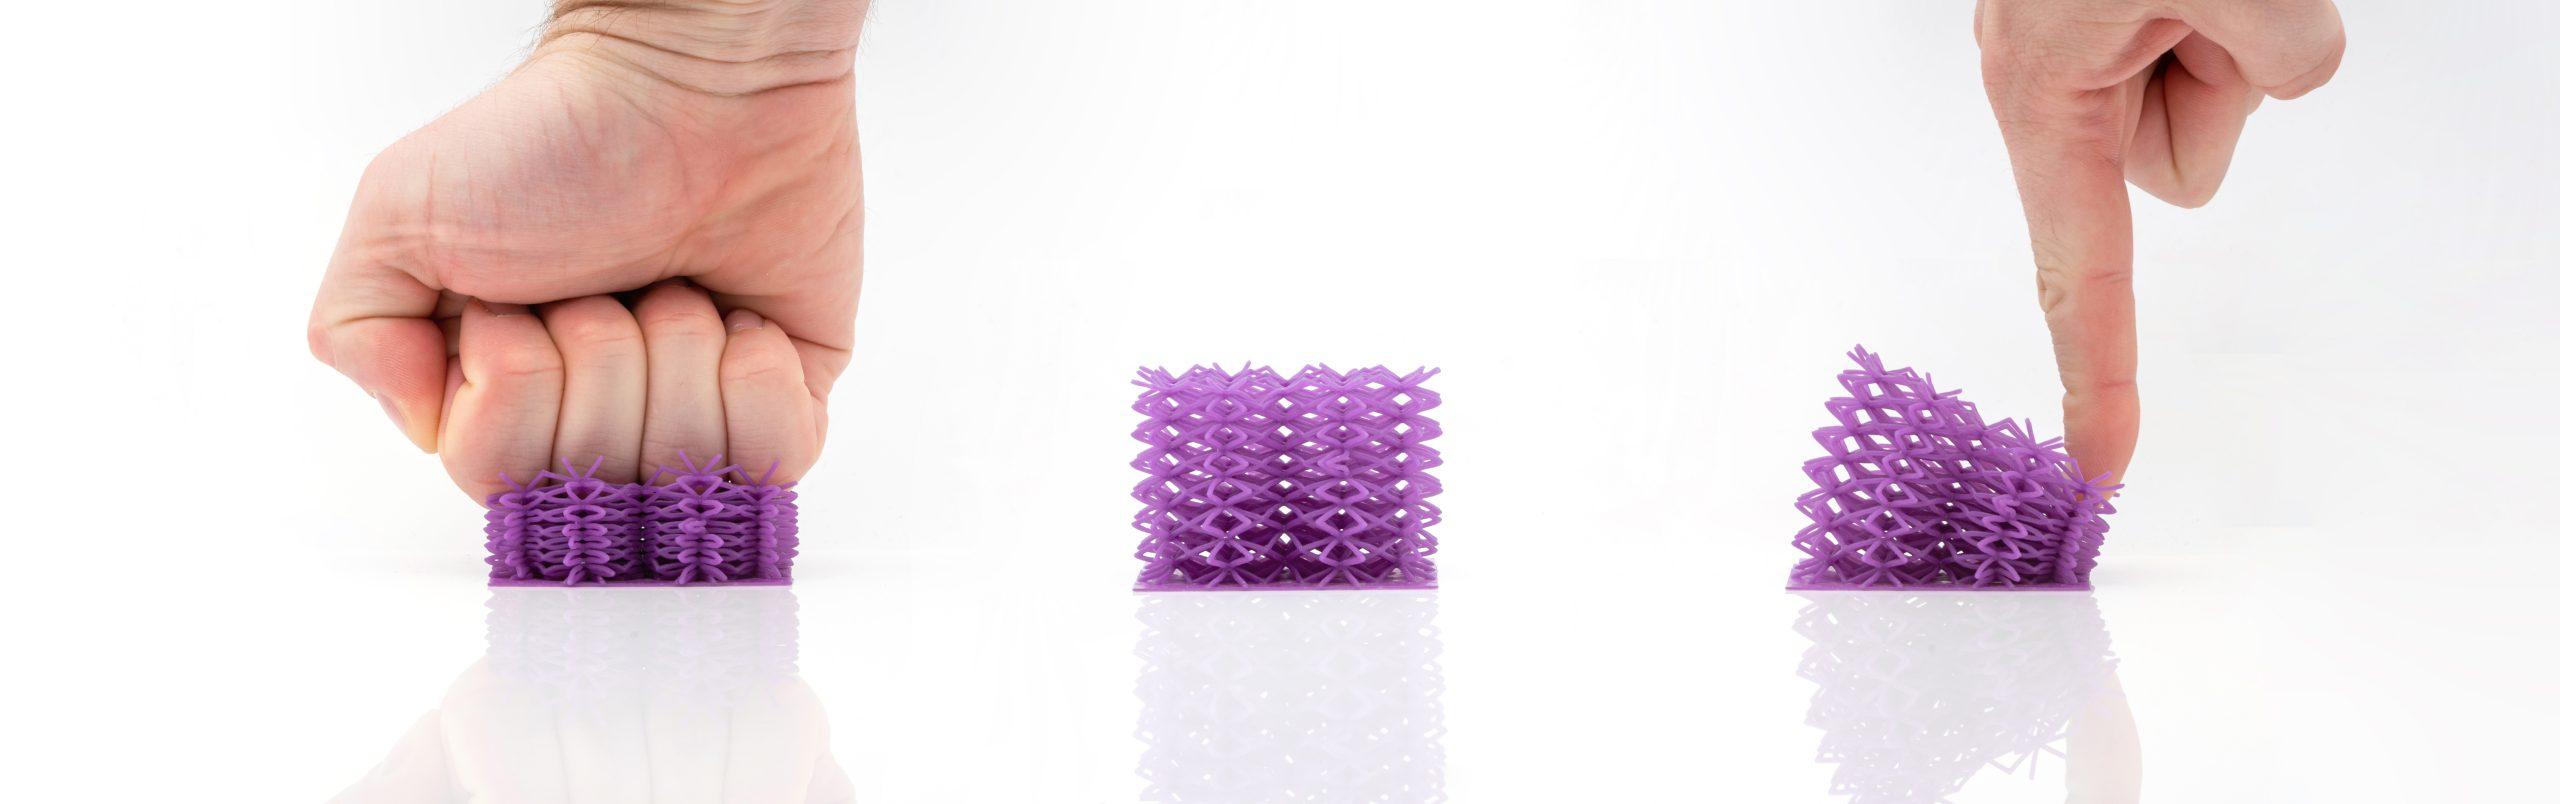 Evonik and Cubicure's INFINAM FL 6300 L resin. Photo via Evonik.